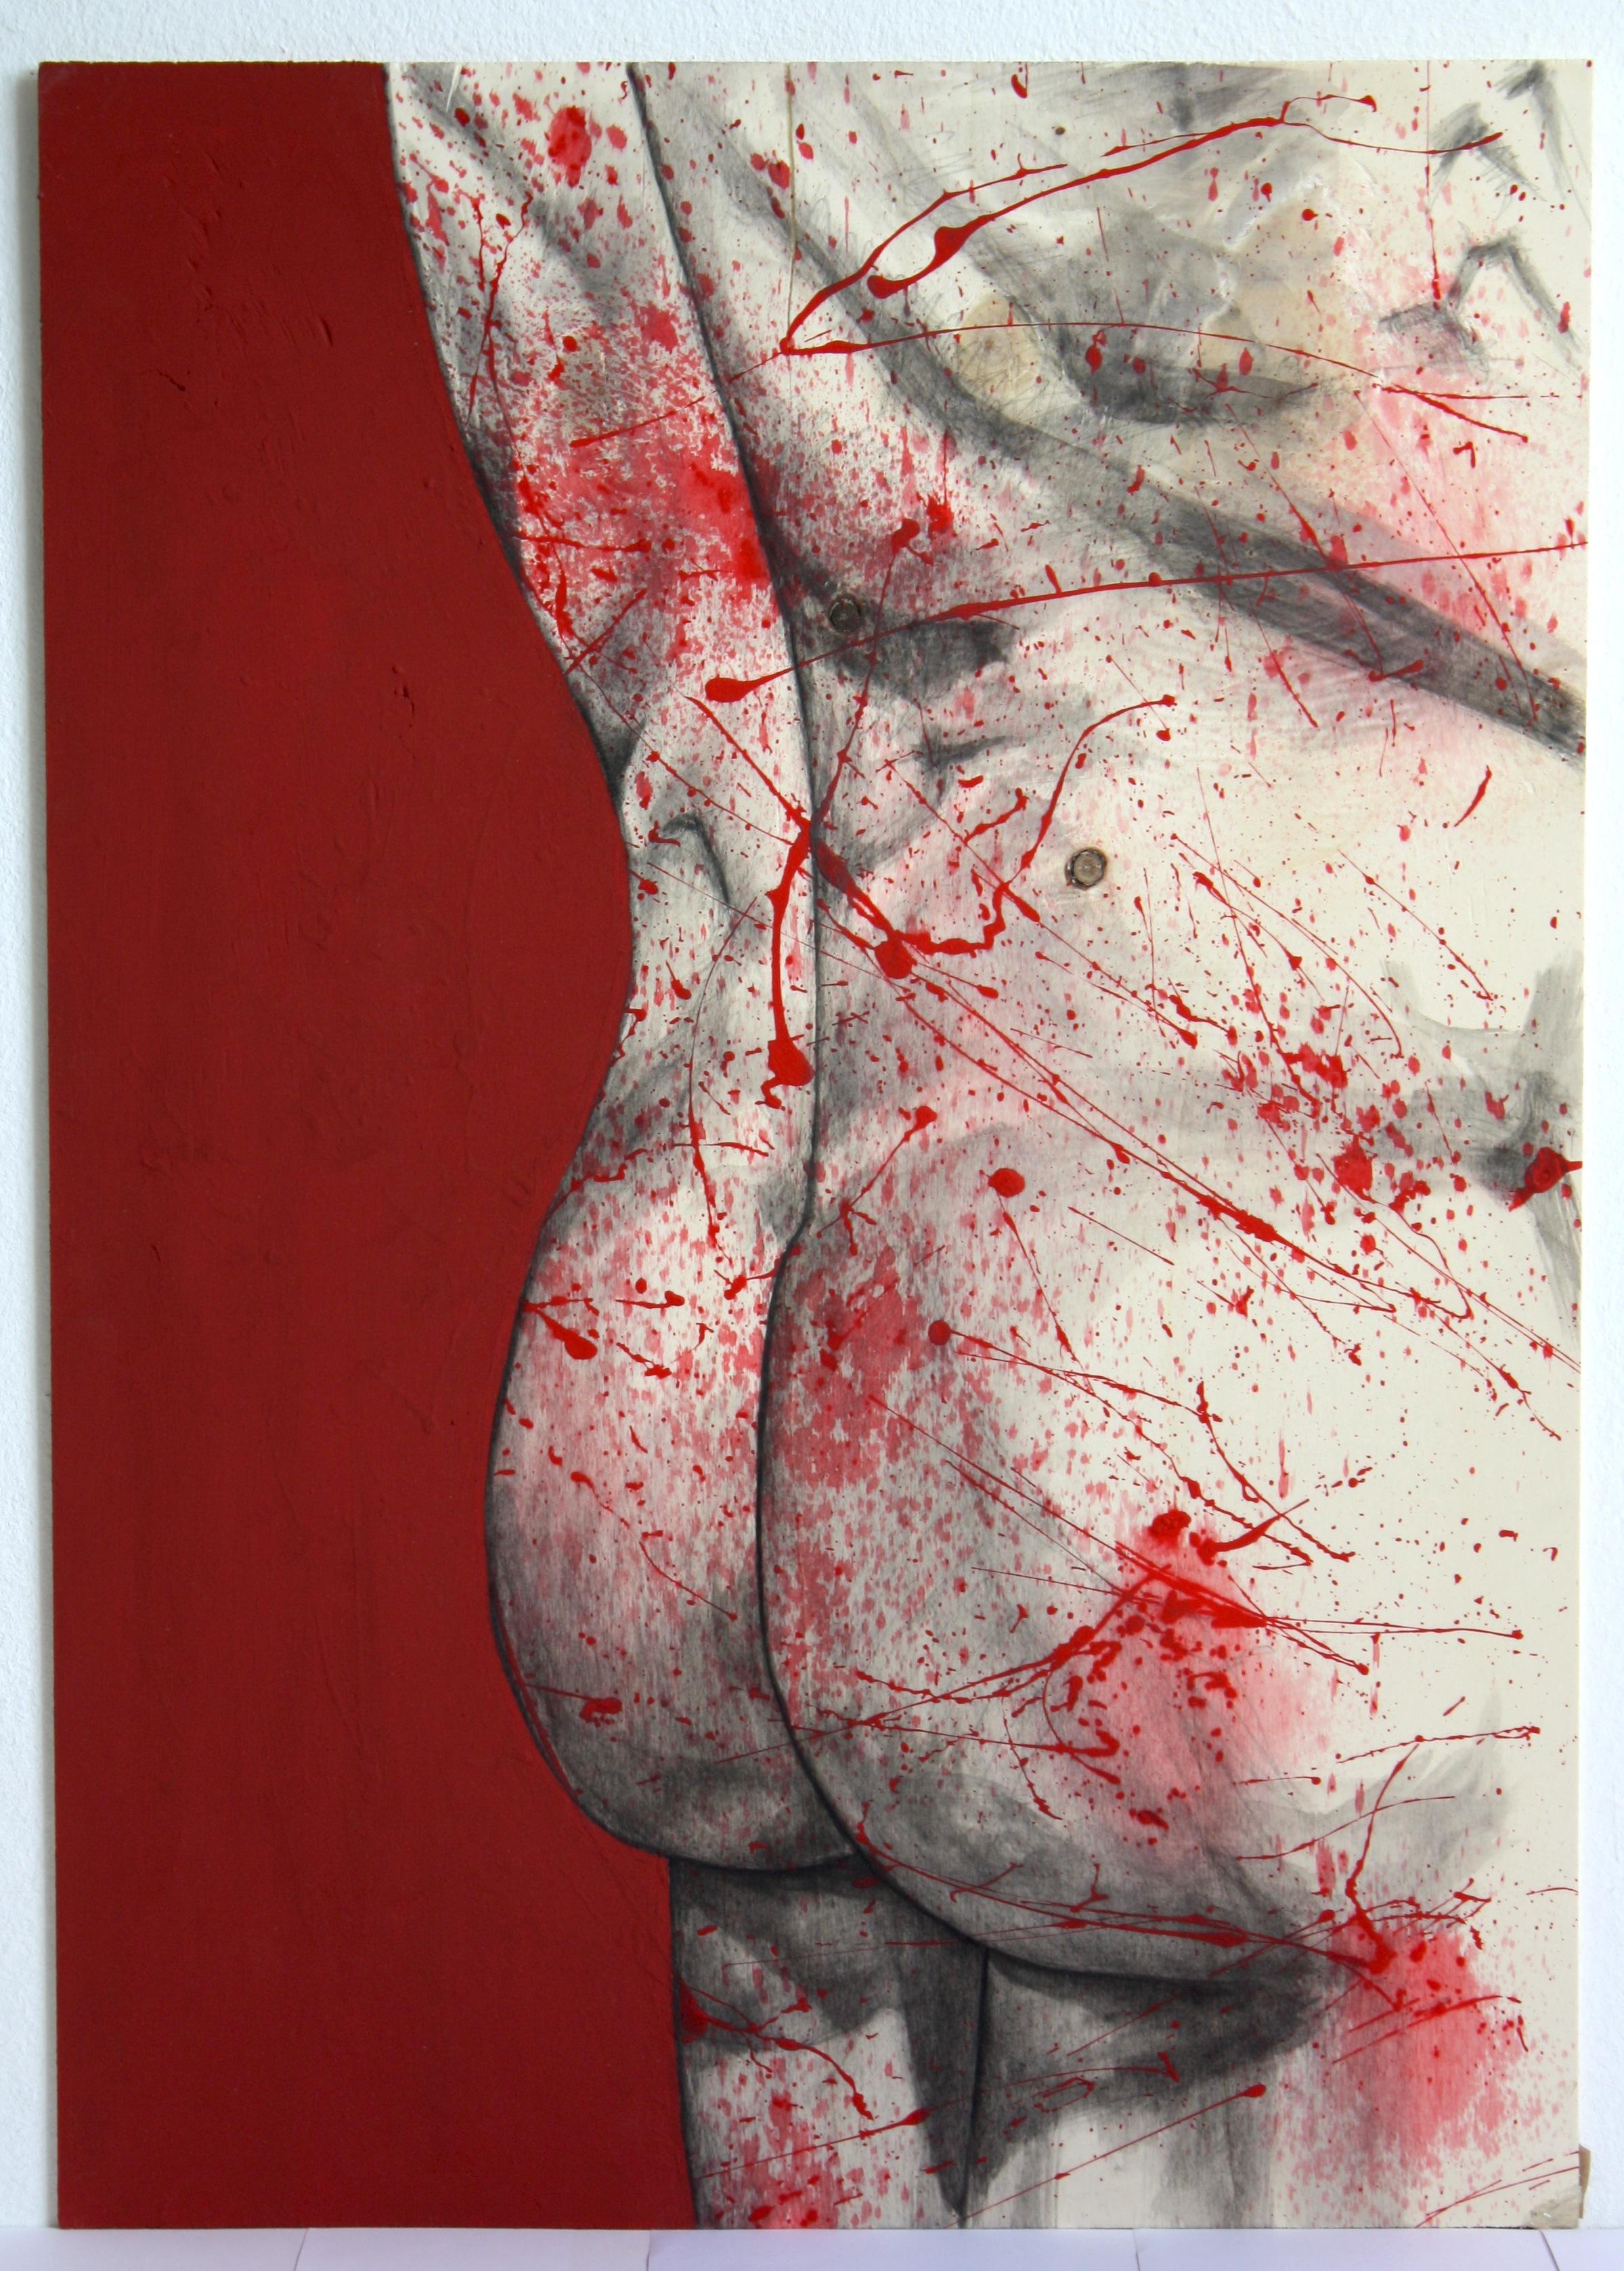 Pollock'd Backside, Red